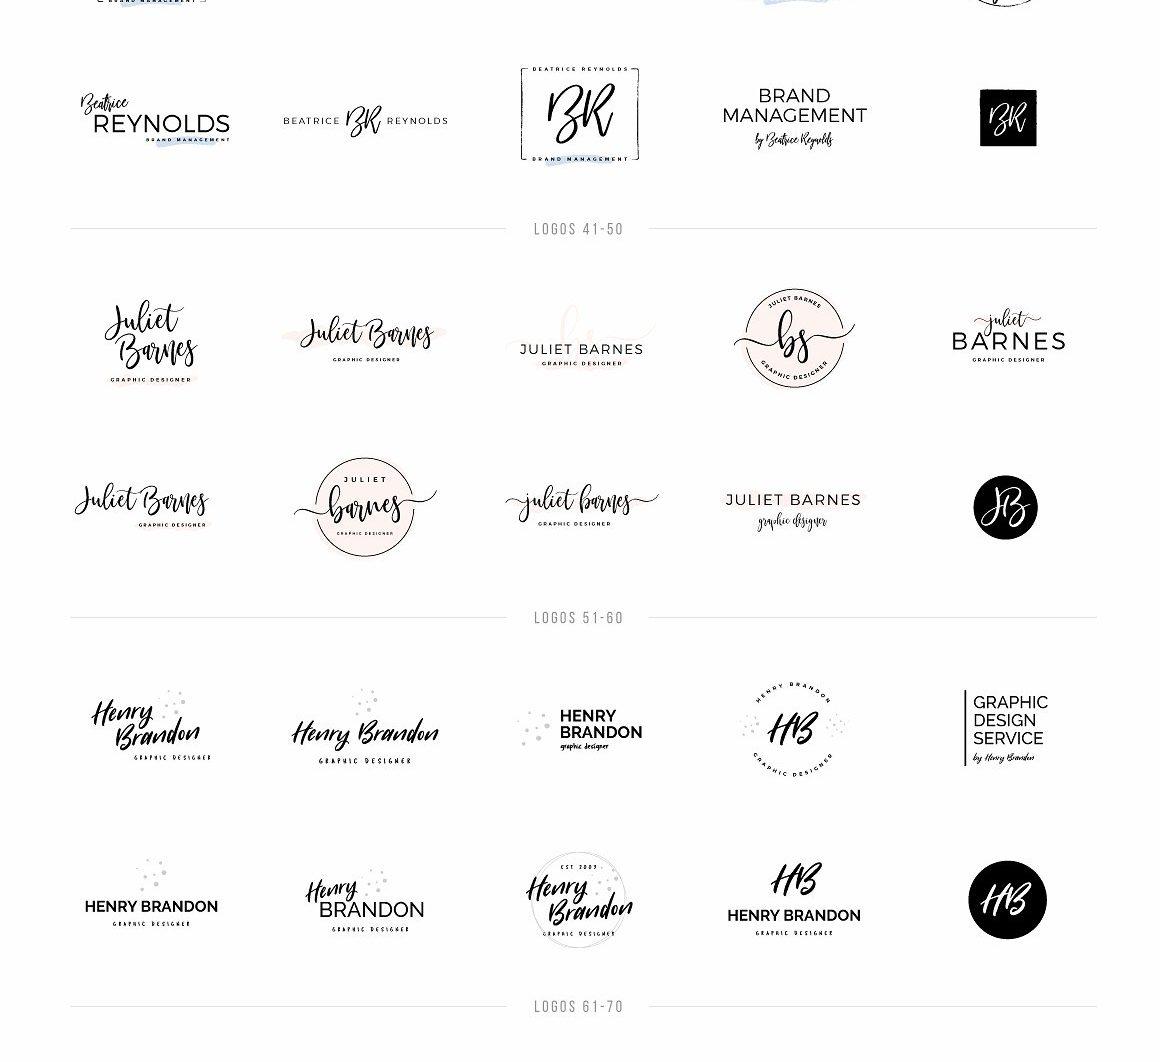 Typographer's Dream Box + 200 Logos - logos 1 100 2 scaled -